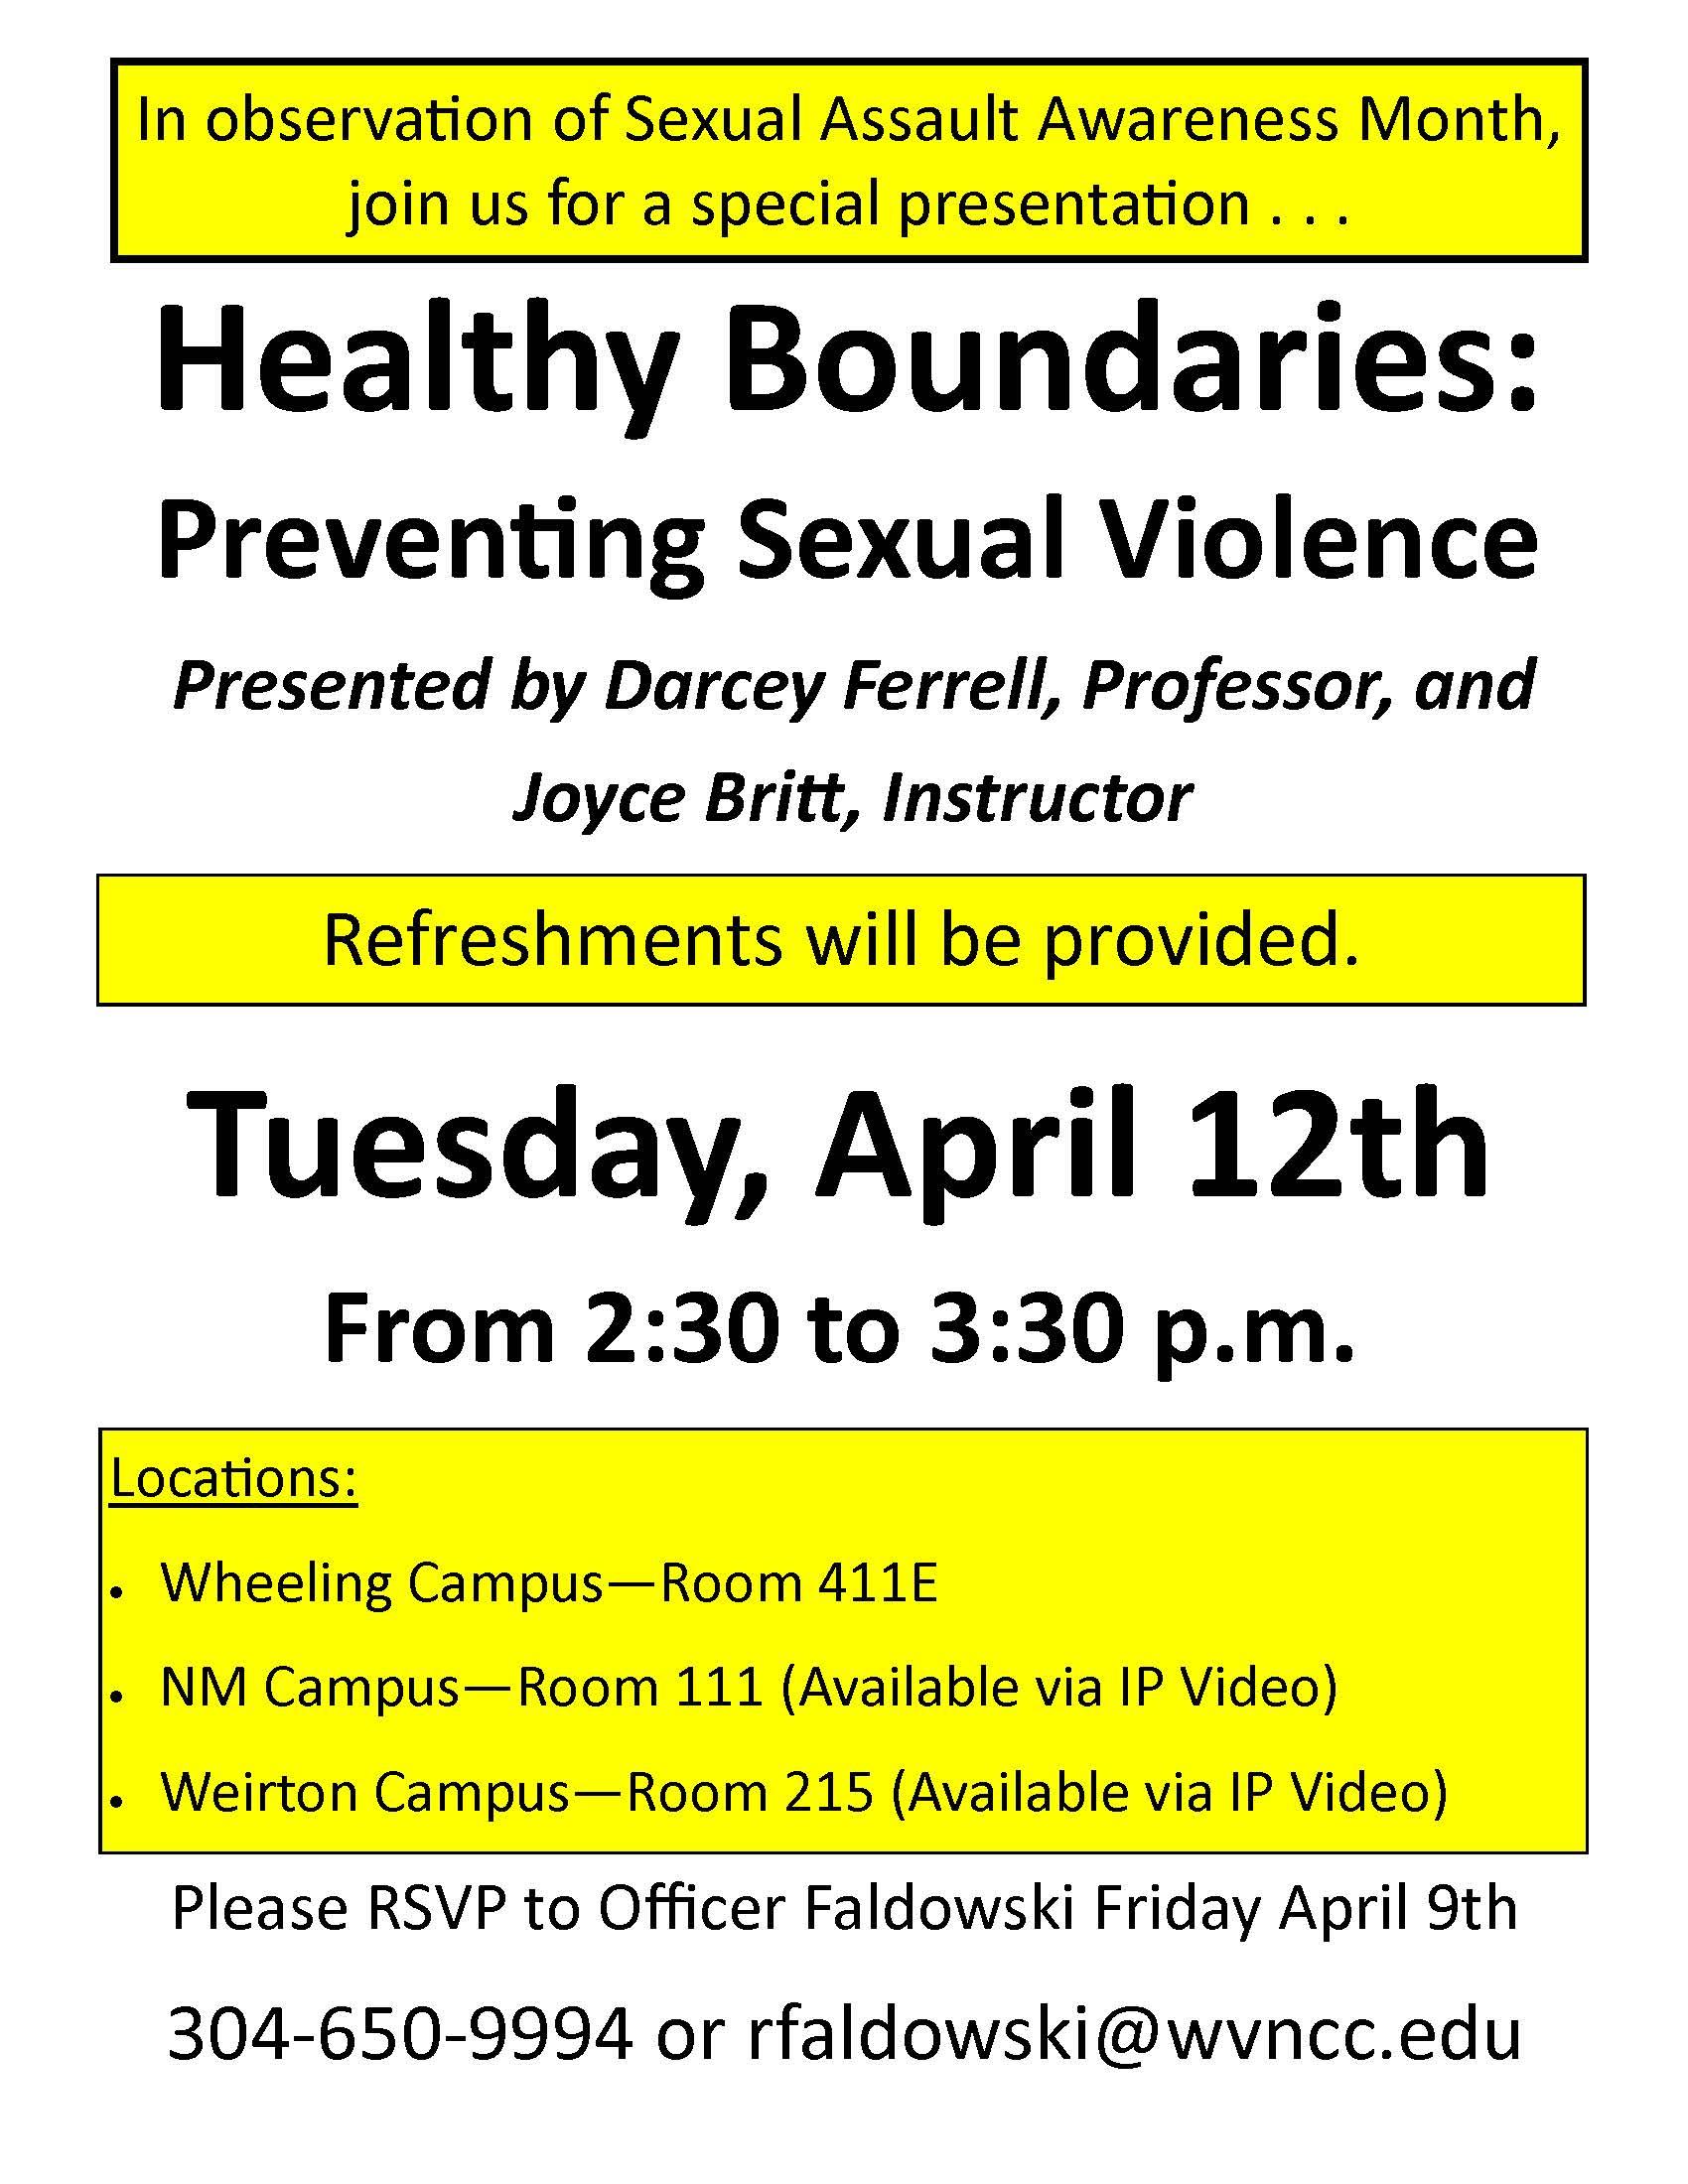 Healthy Boundaries Flyer